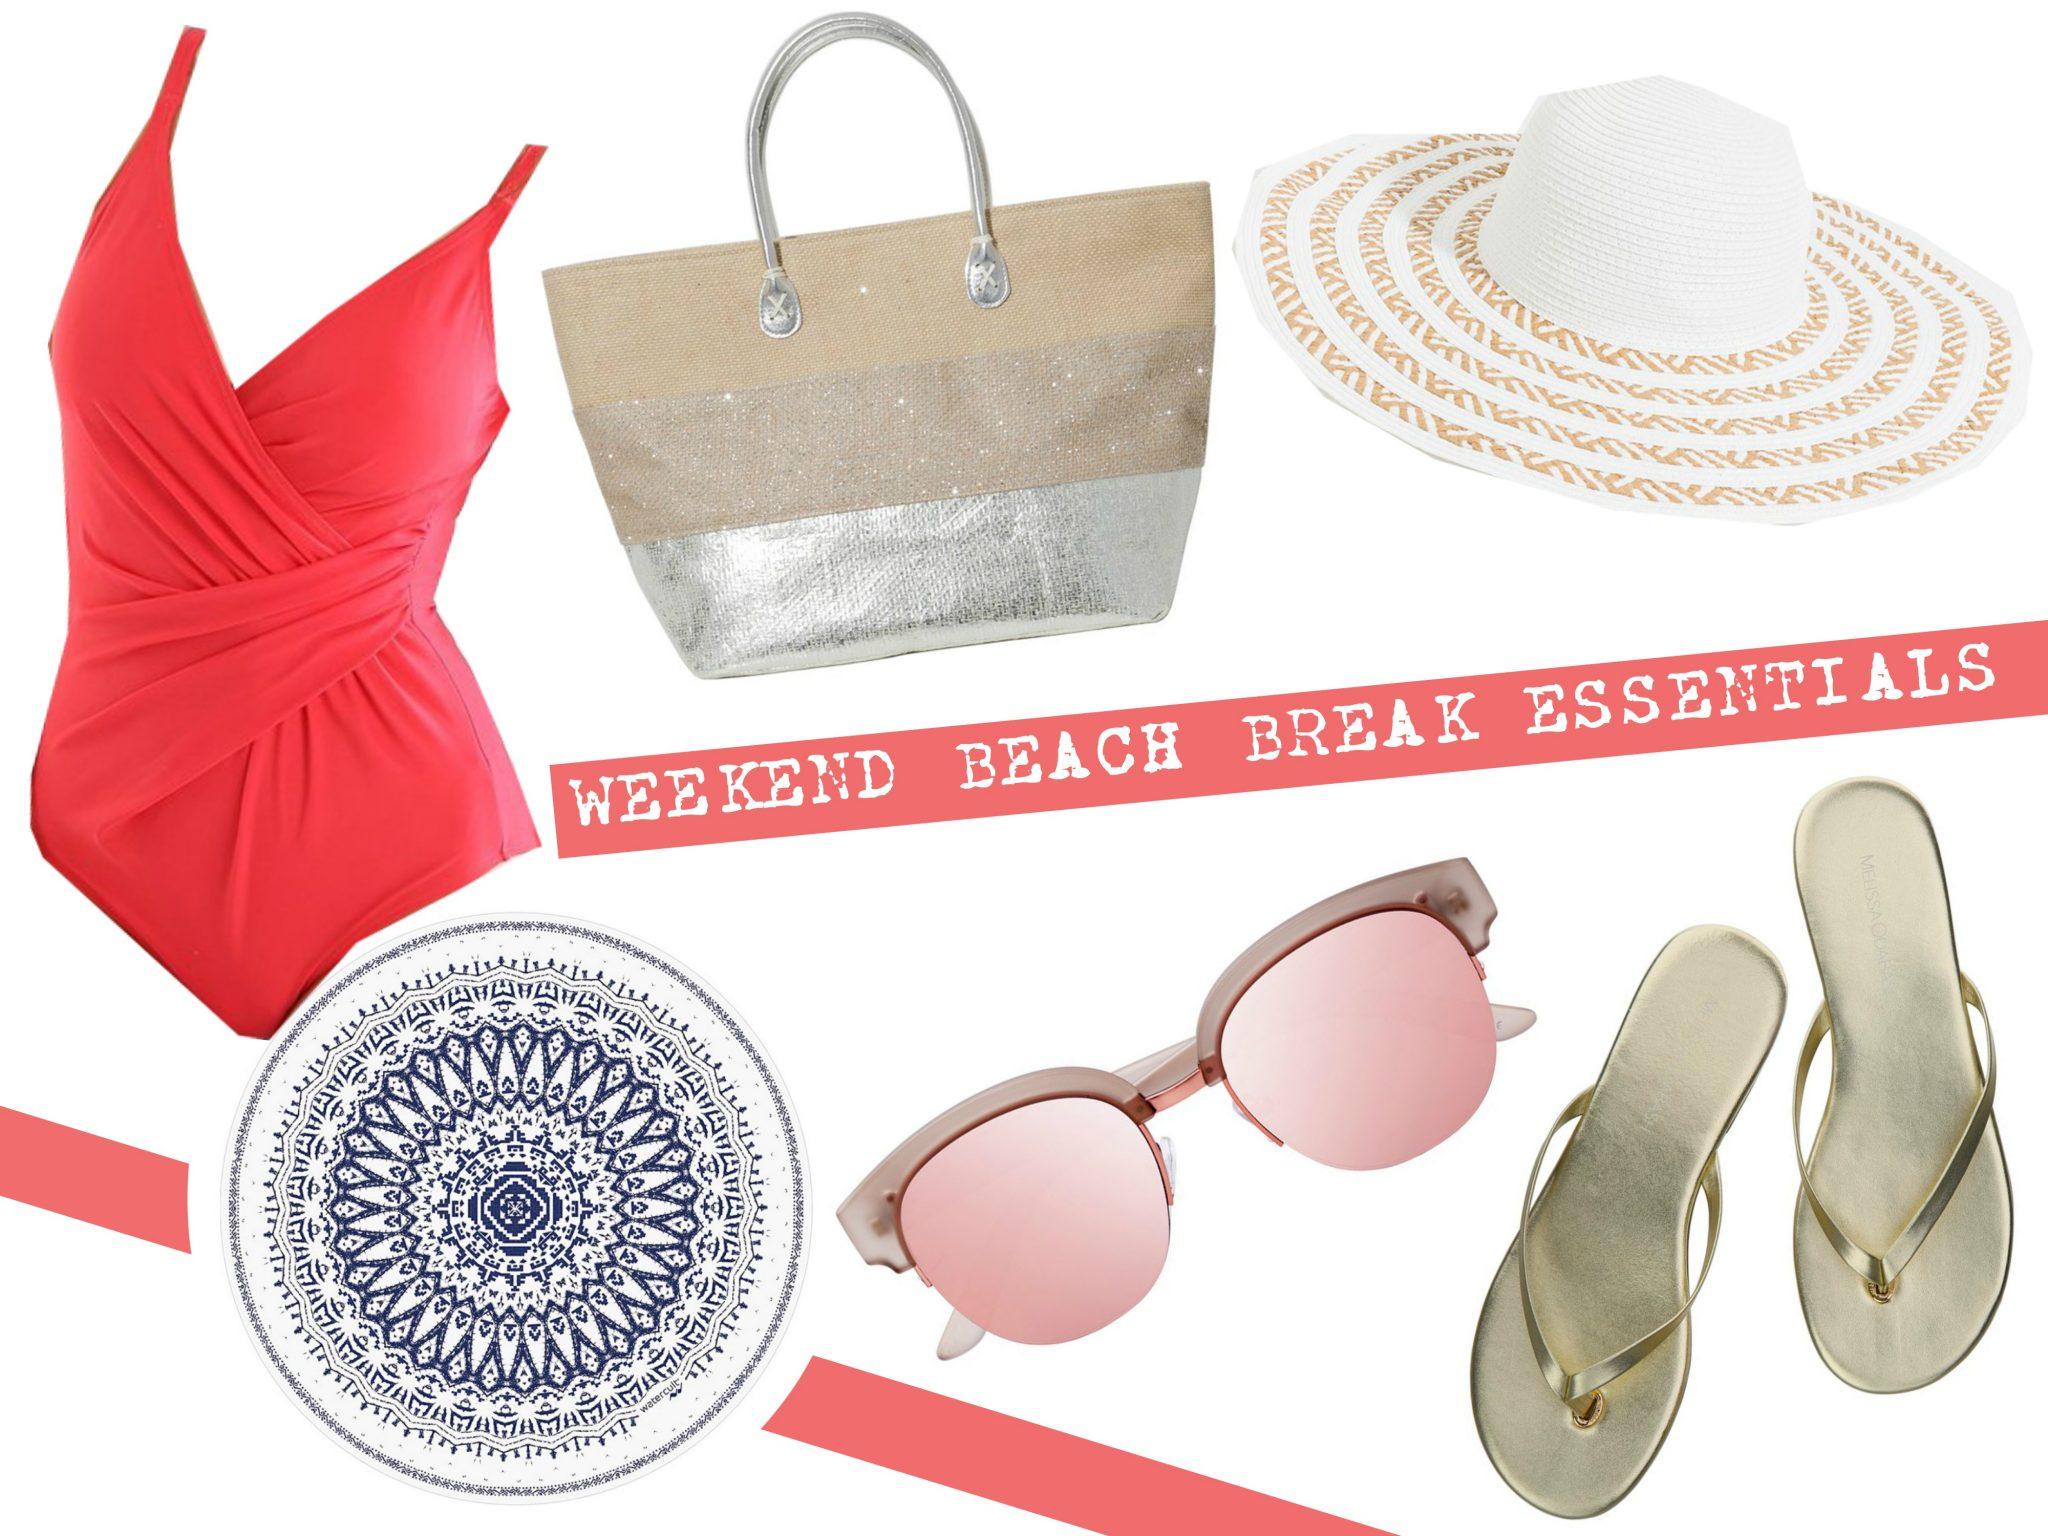 Weekend beach break essentials